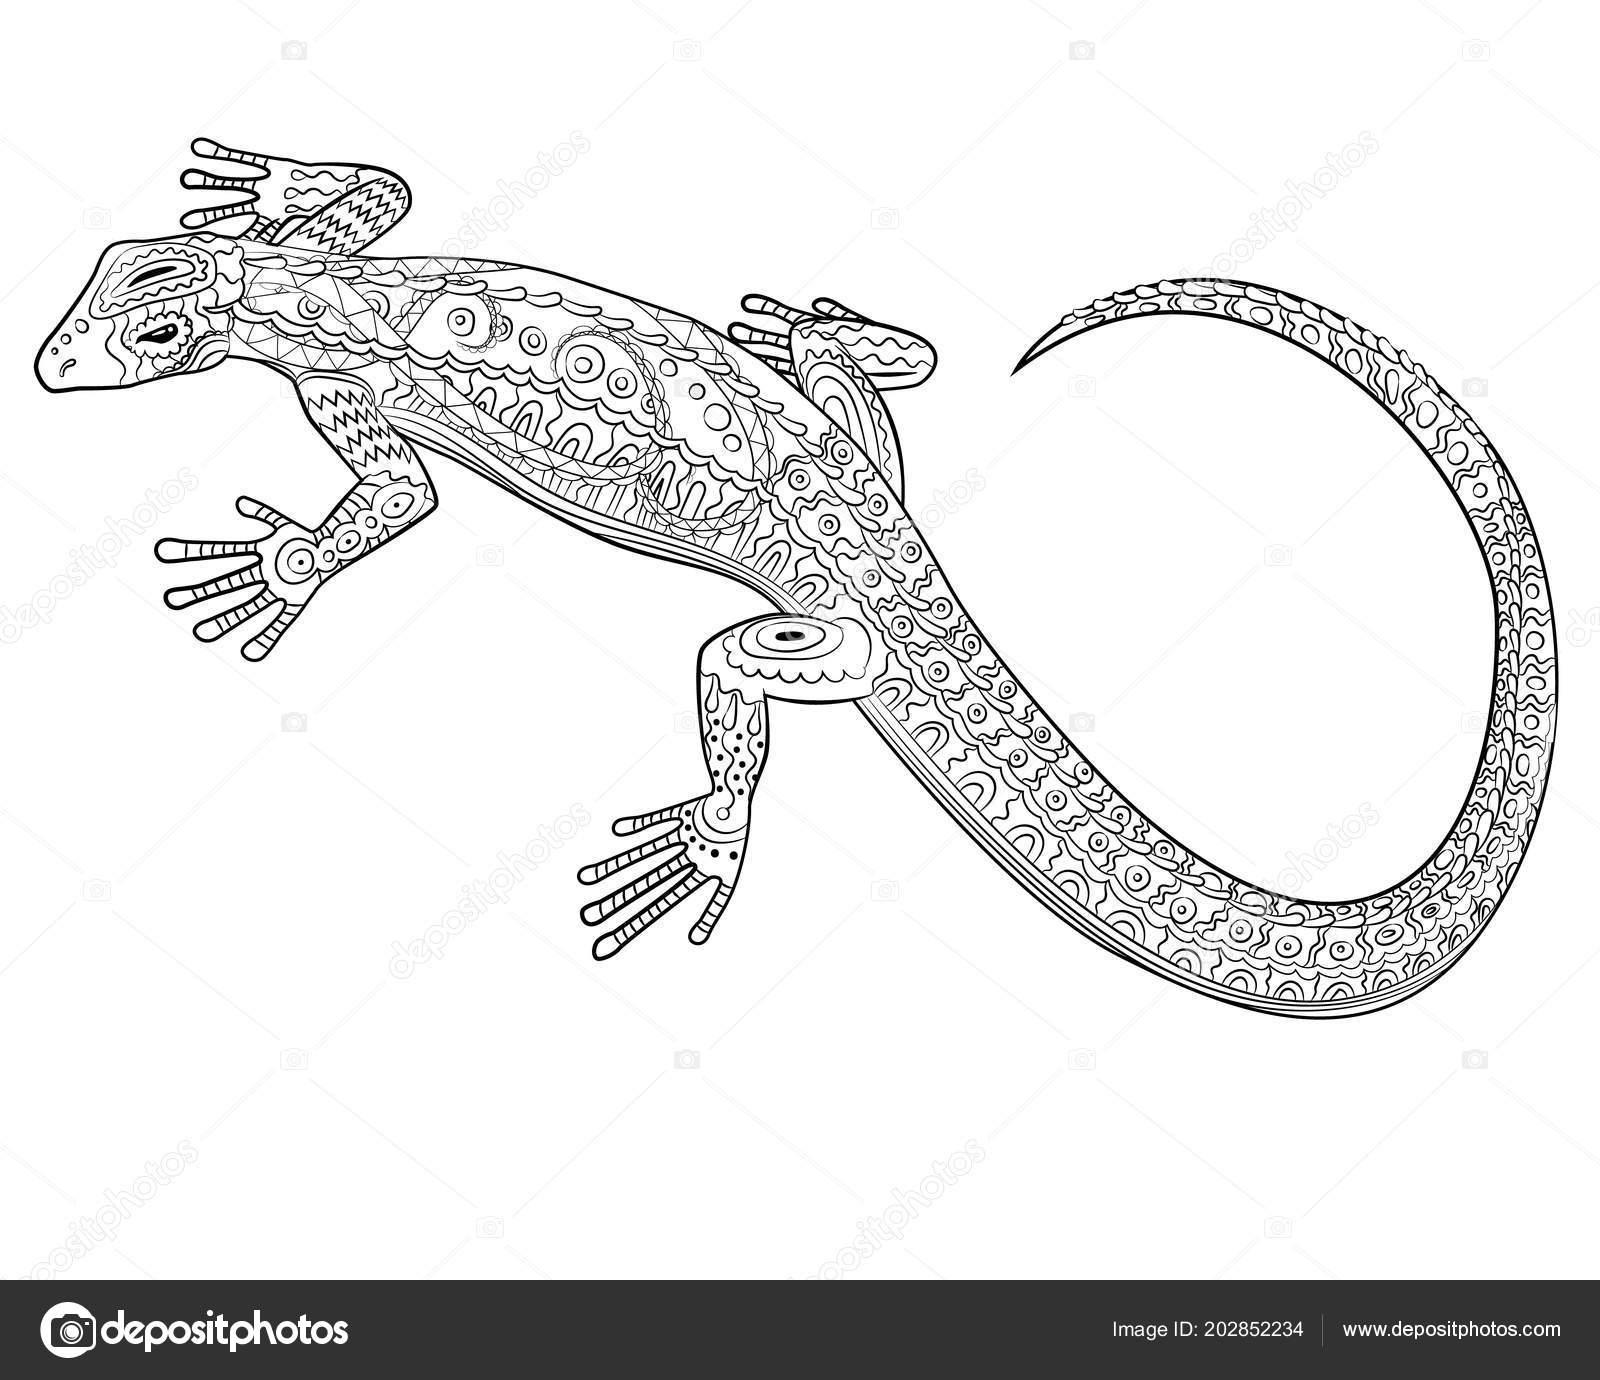 malvorlage reptil  coloring and malvorlagan